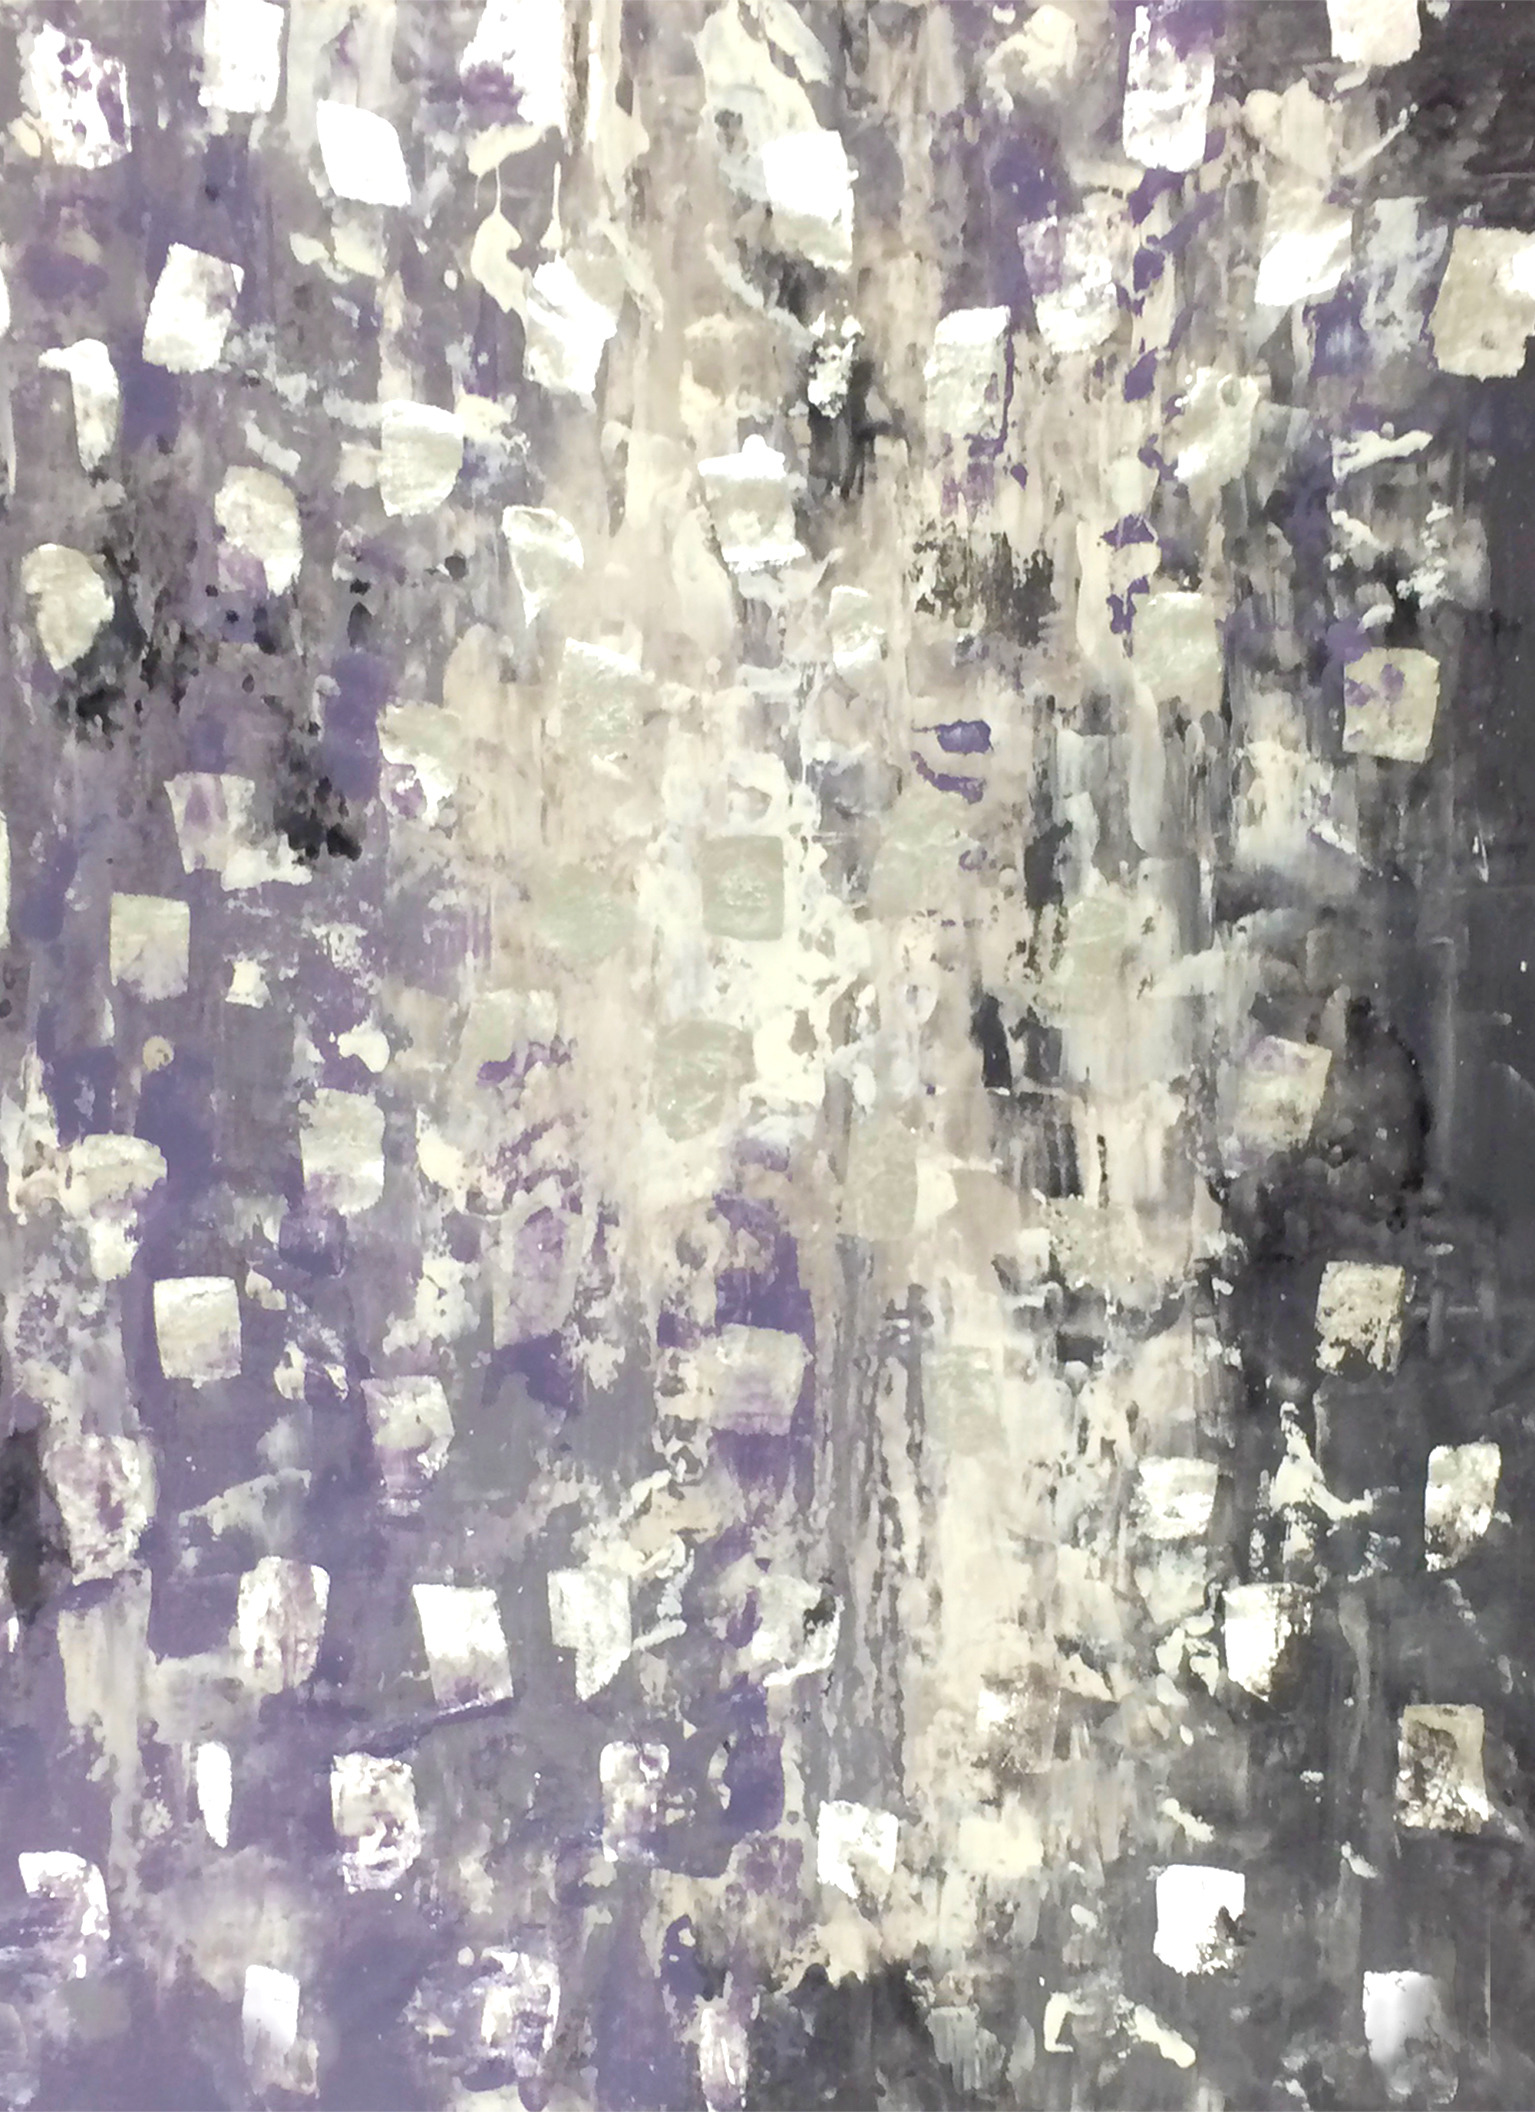 Lavender falls qgo29r